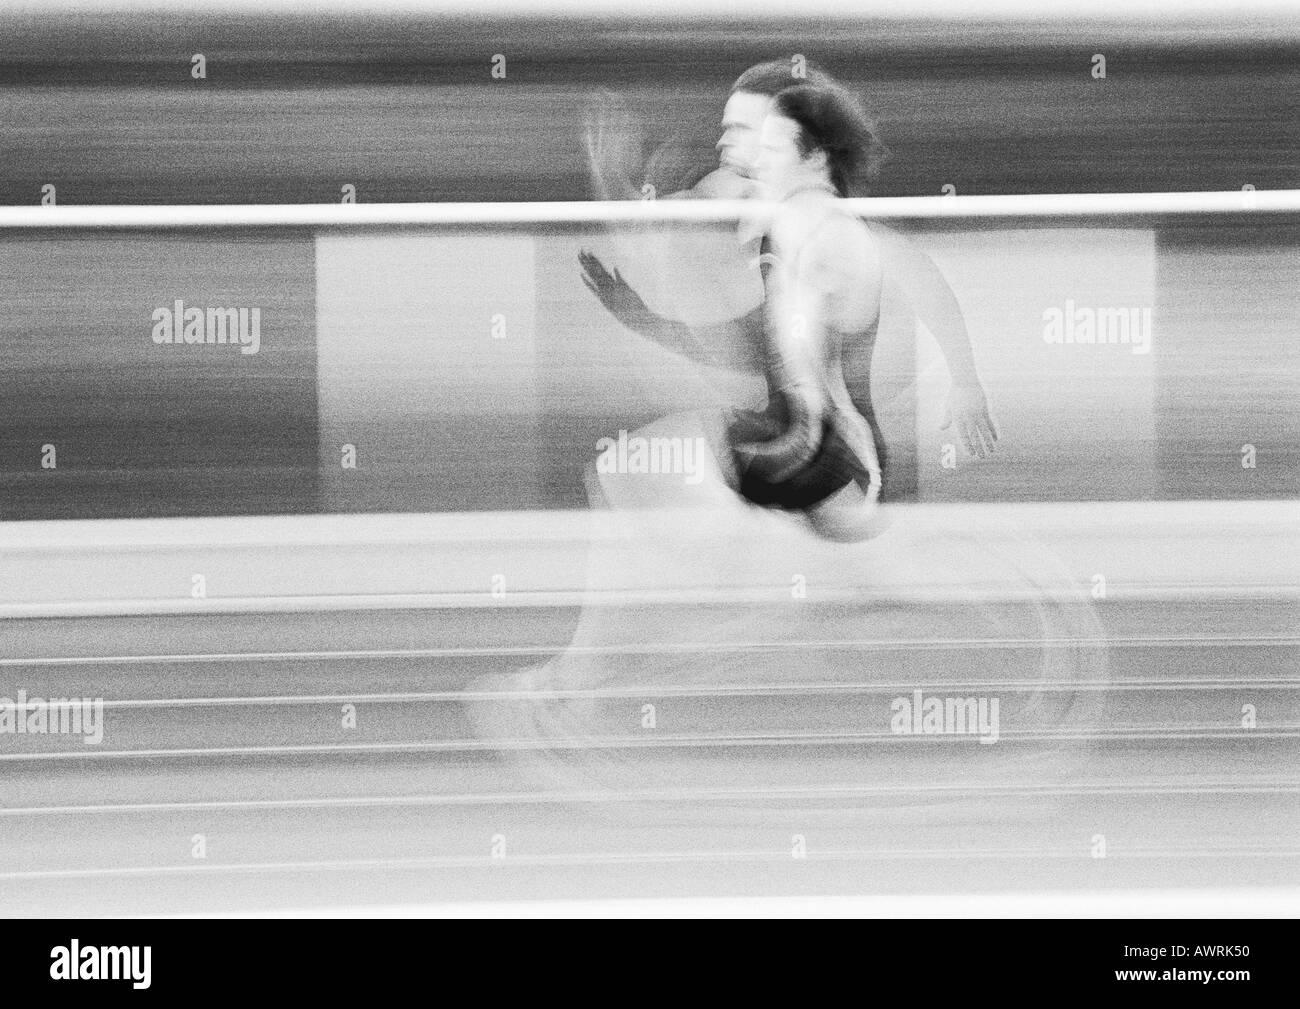 Male athlete running fast, blurred motion, b&w Stock Photo